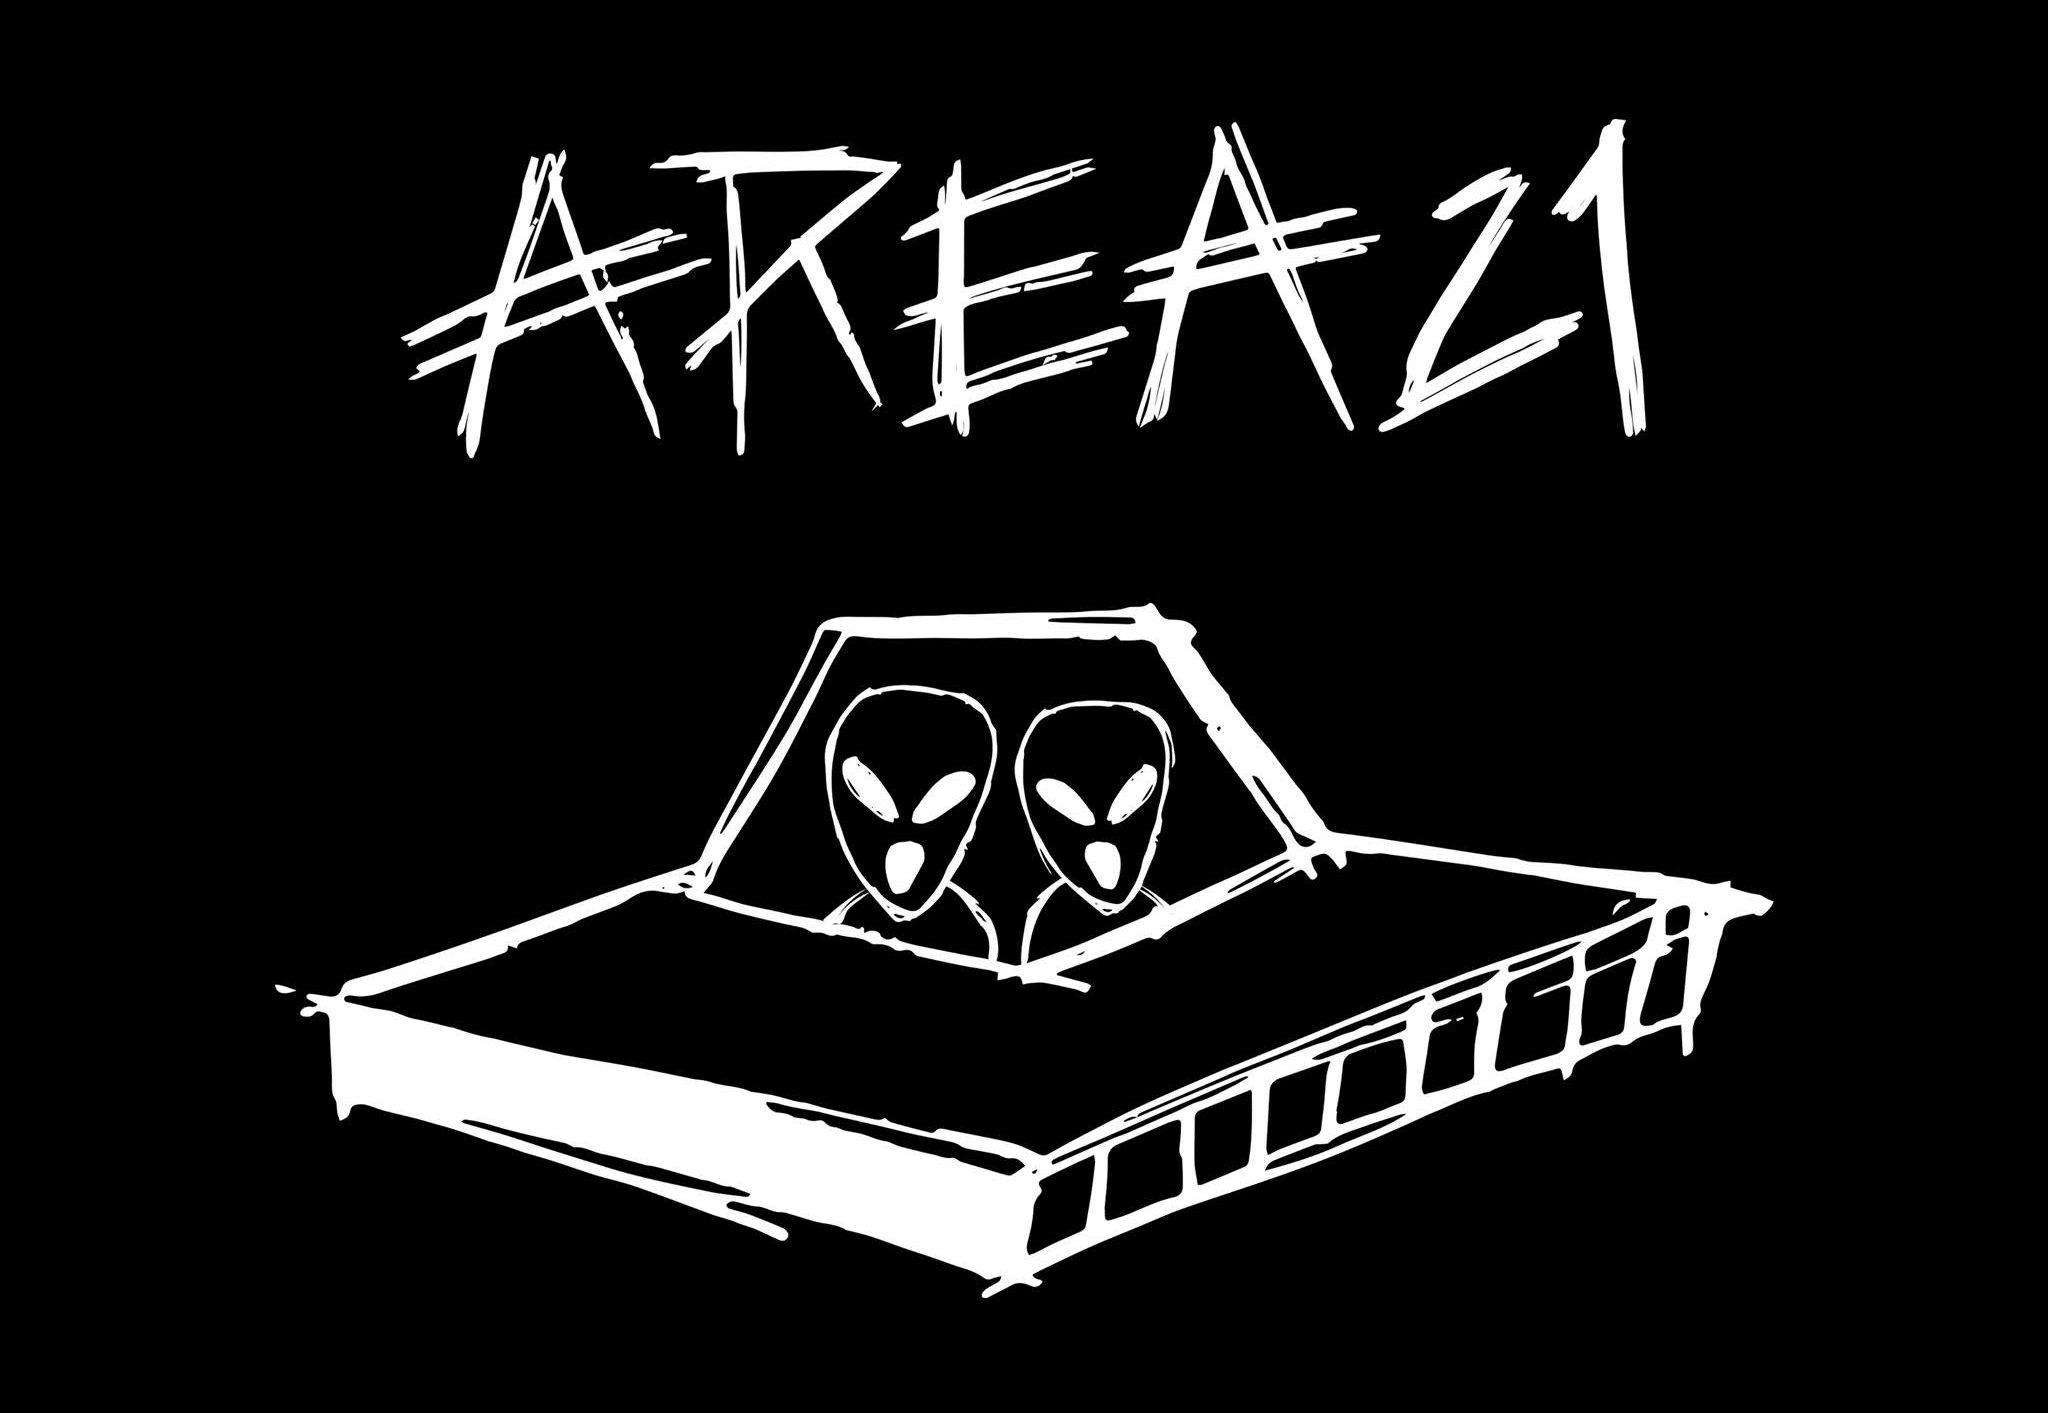 Martin GarrixとMaejorによる共同プロジェクトで確定か!?謎に包まれたデュオ、AREA21とは!